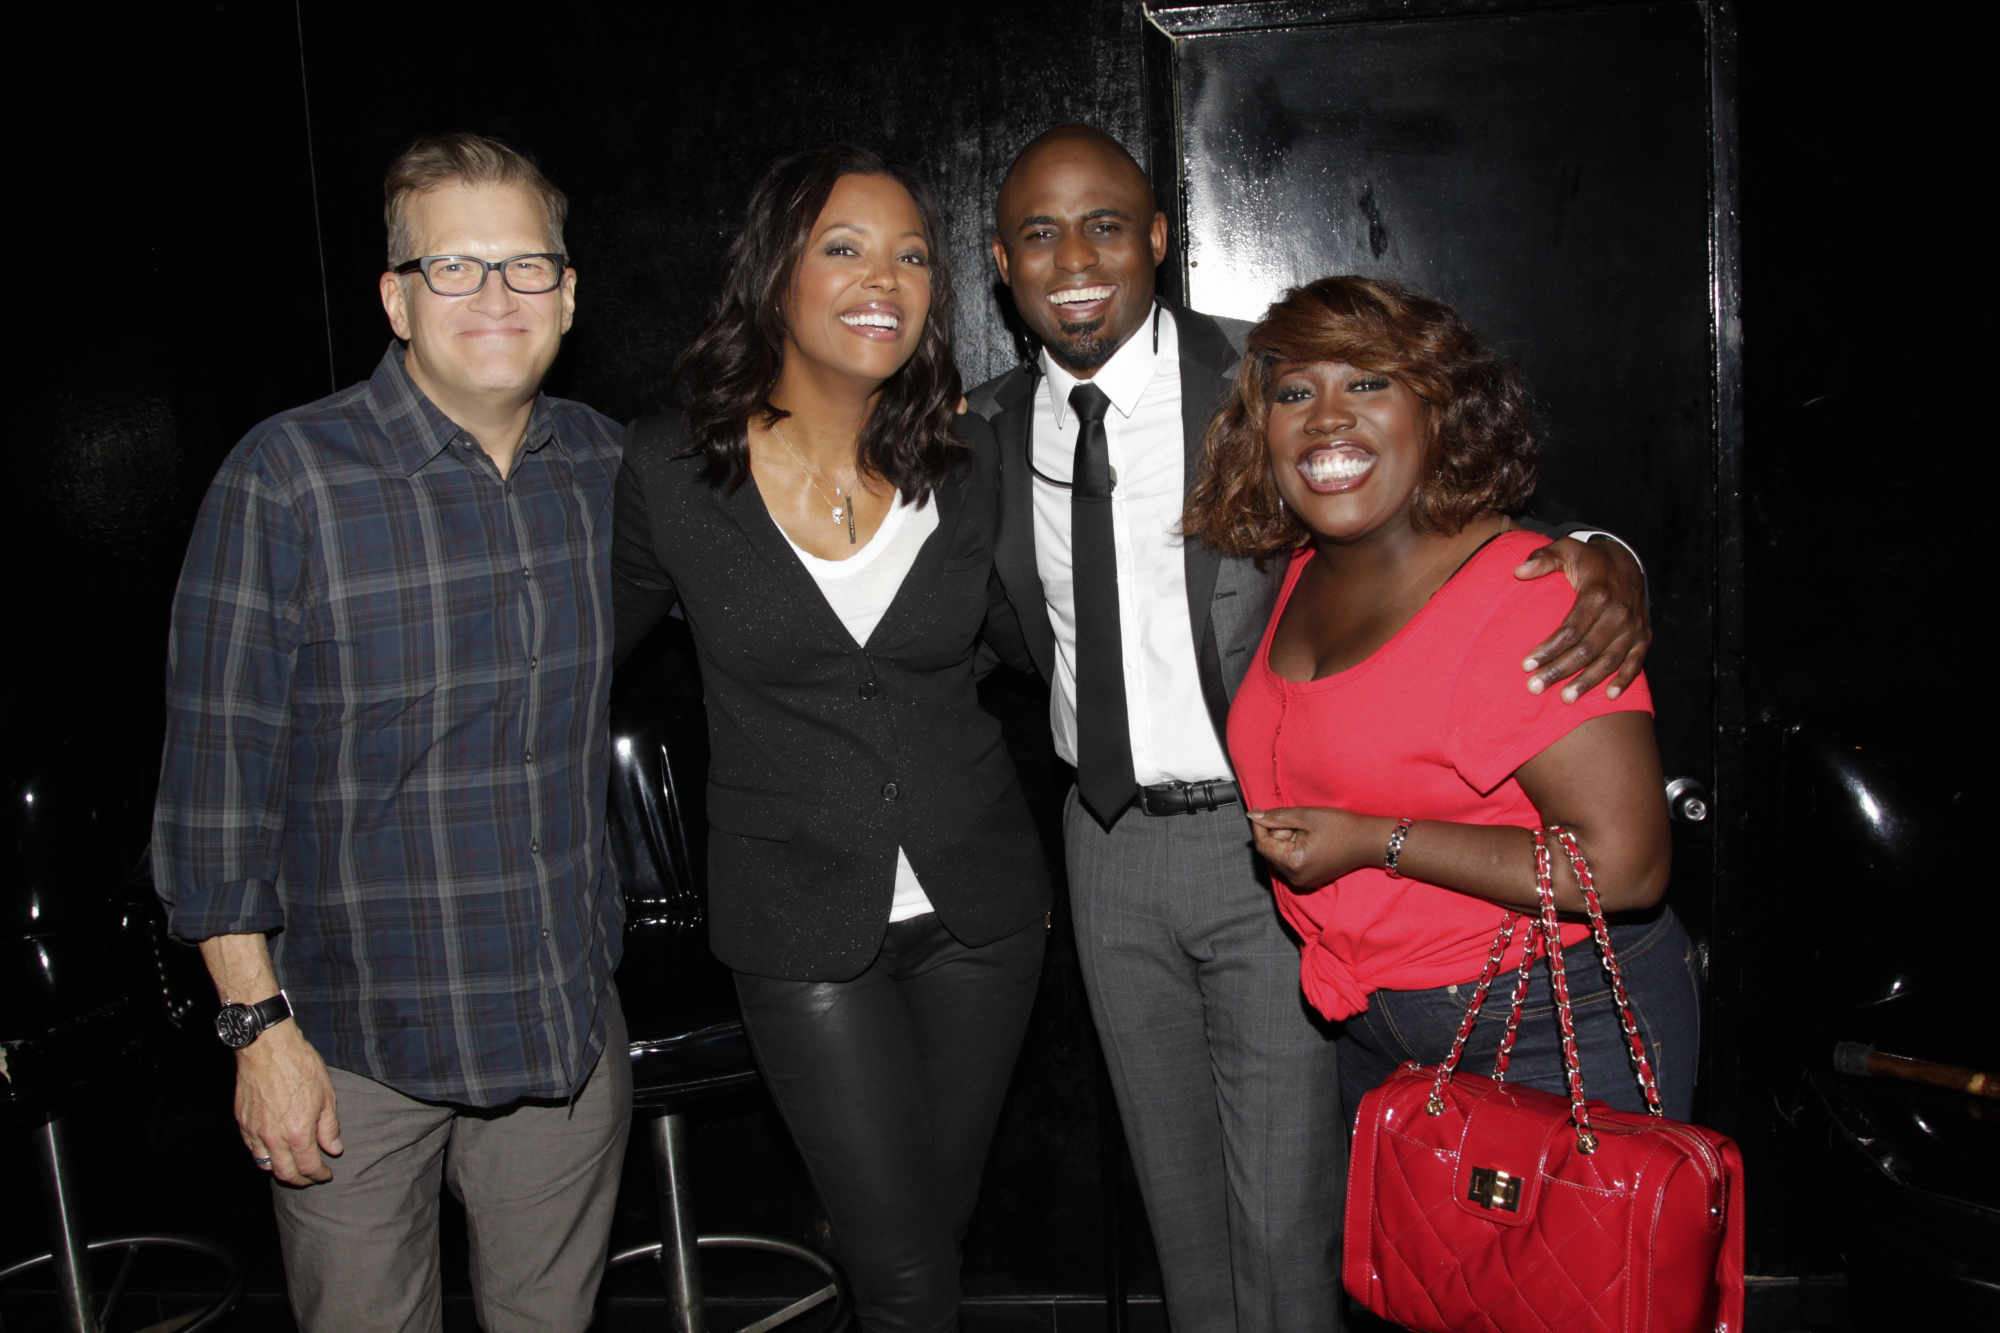 Drew, Aisha, Wayne, and Sheryl